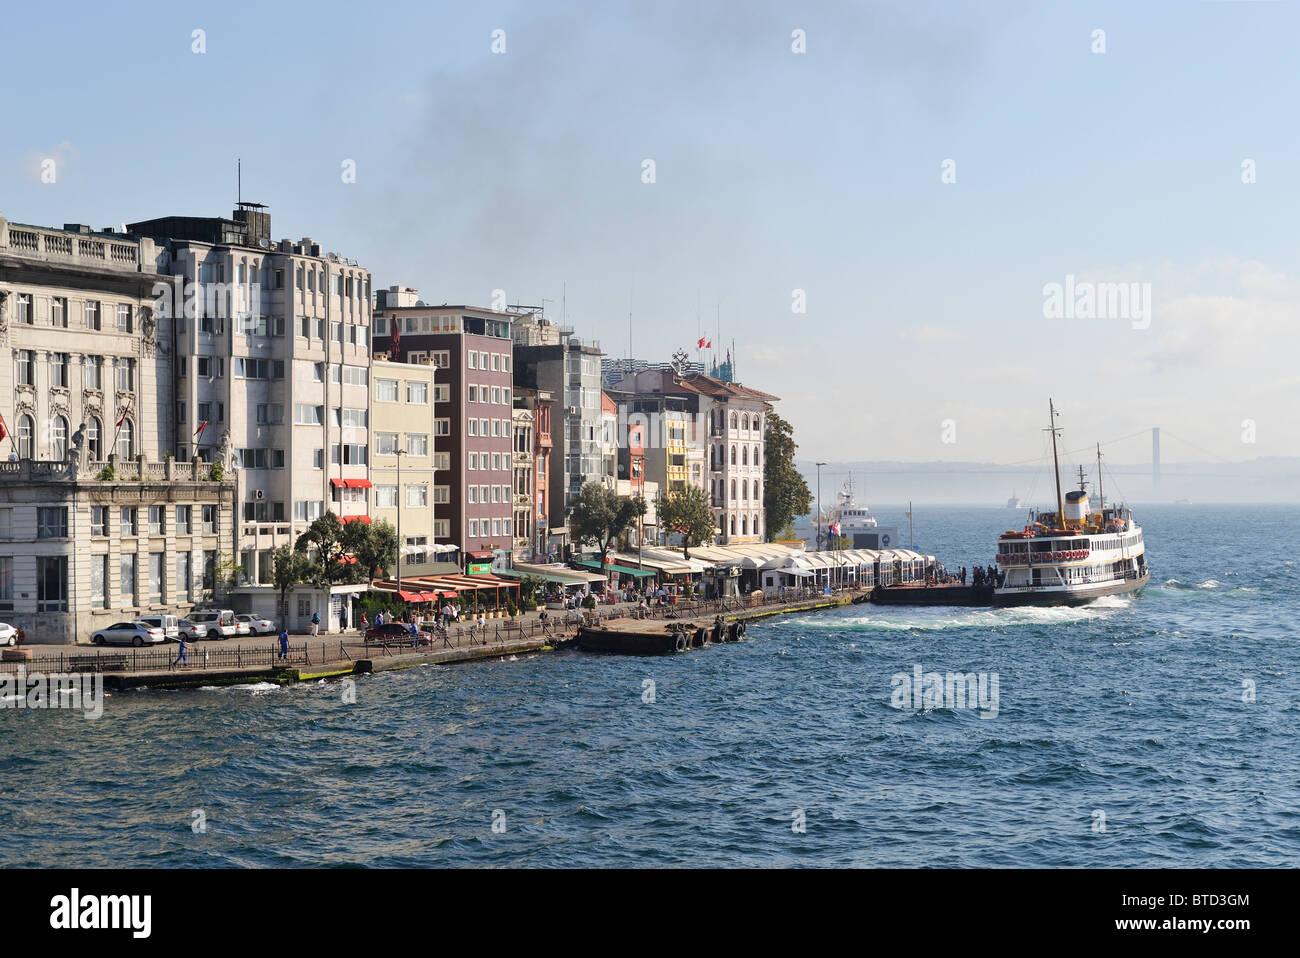 Karaköy, İstanbul, Turkey 100916_35957 - Stock Image